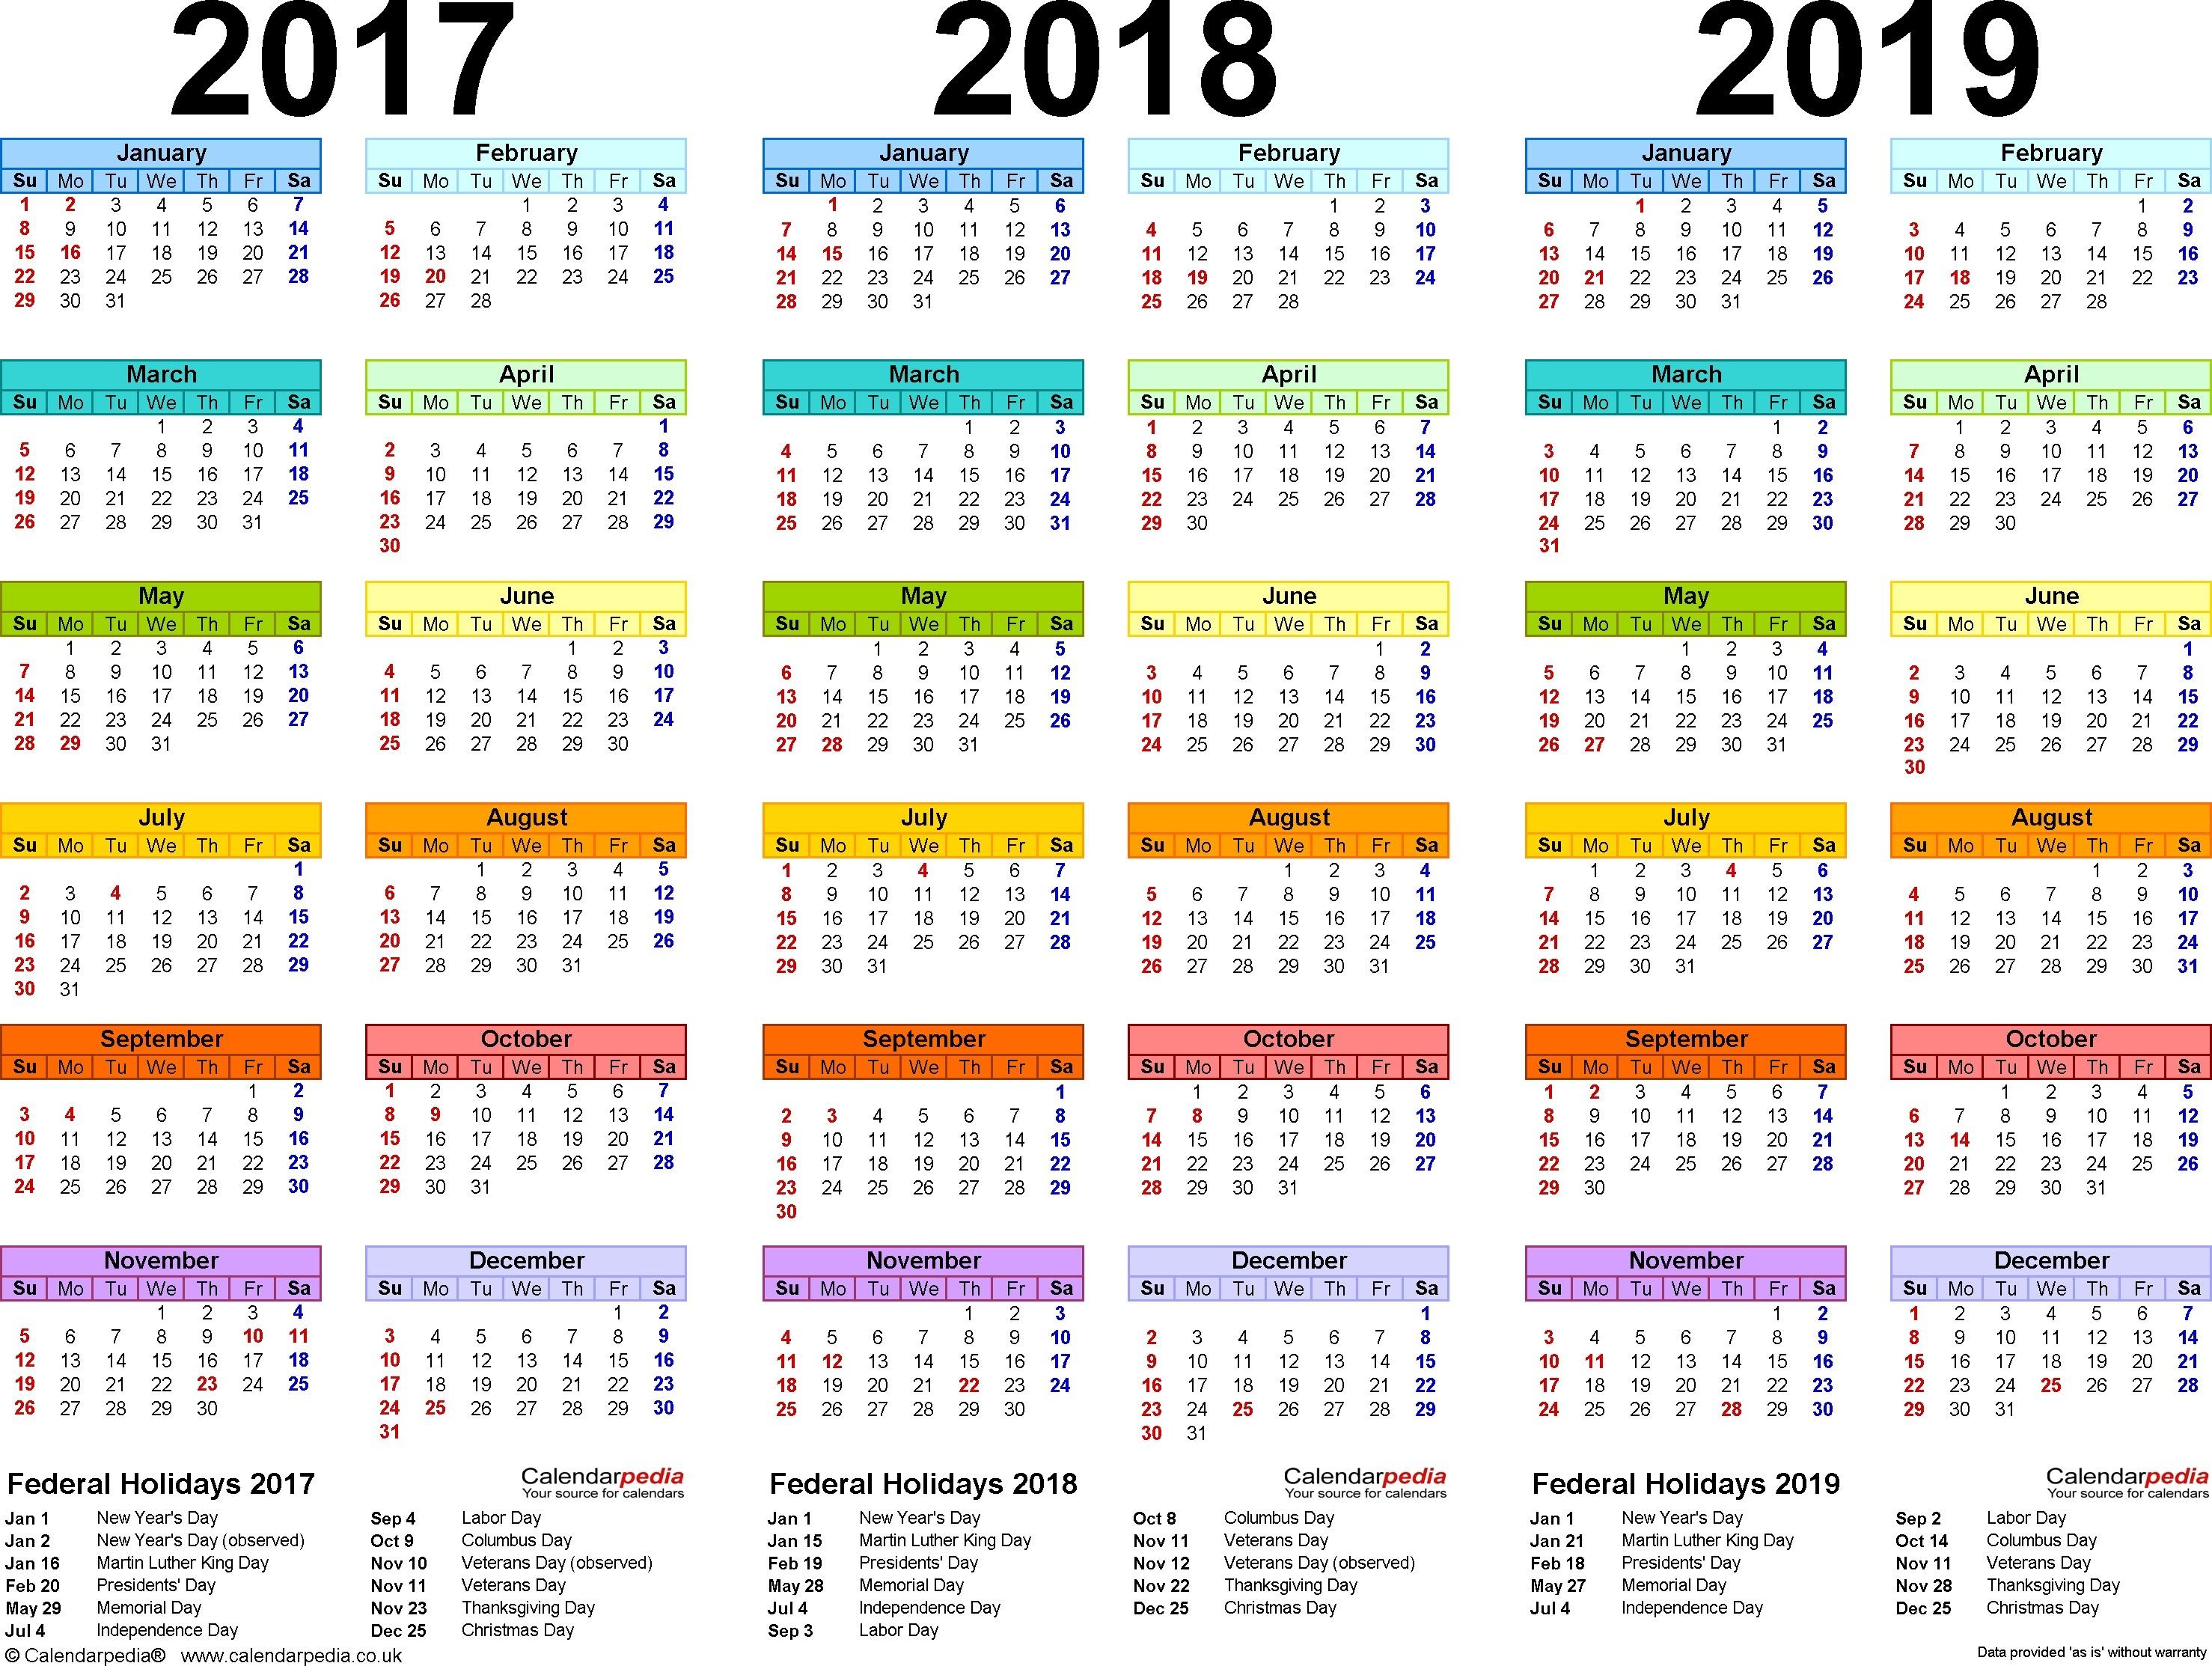 2000 Calendar Year Blank 2018 In Mightymic Urdu Of Month December throughout Urdu Calendar Of Year 2000 Month December